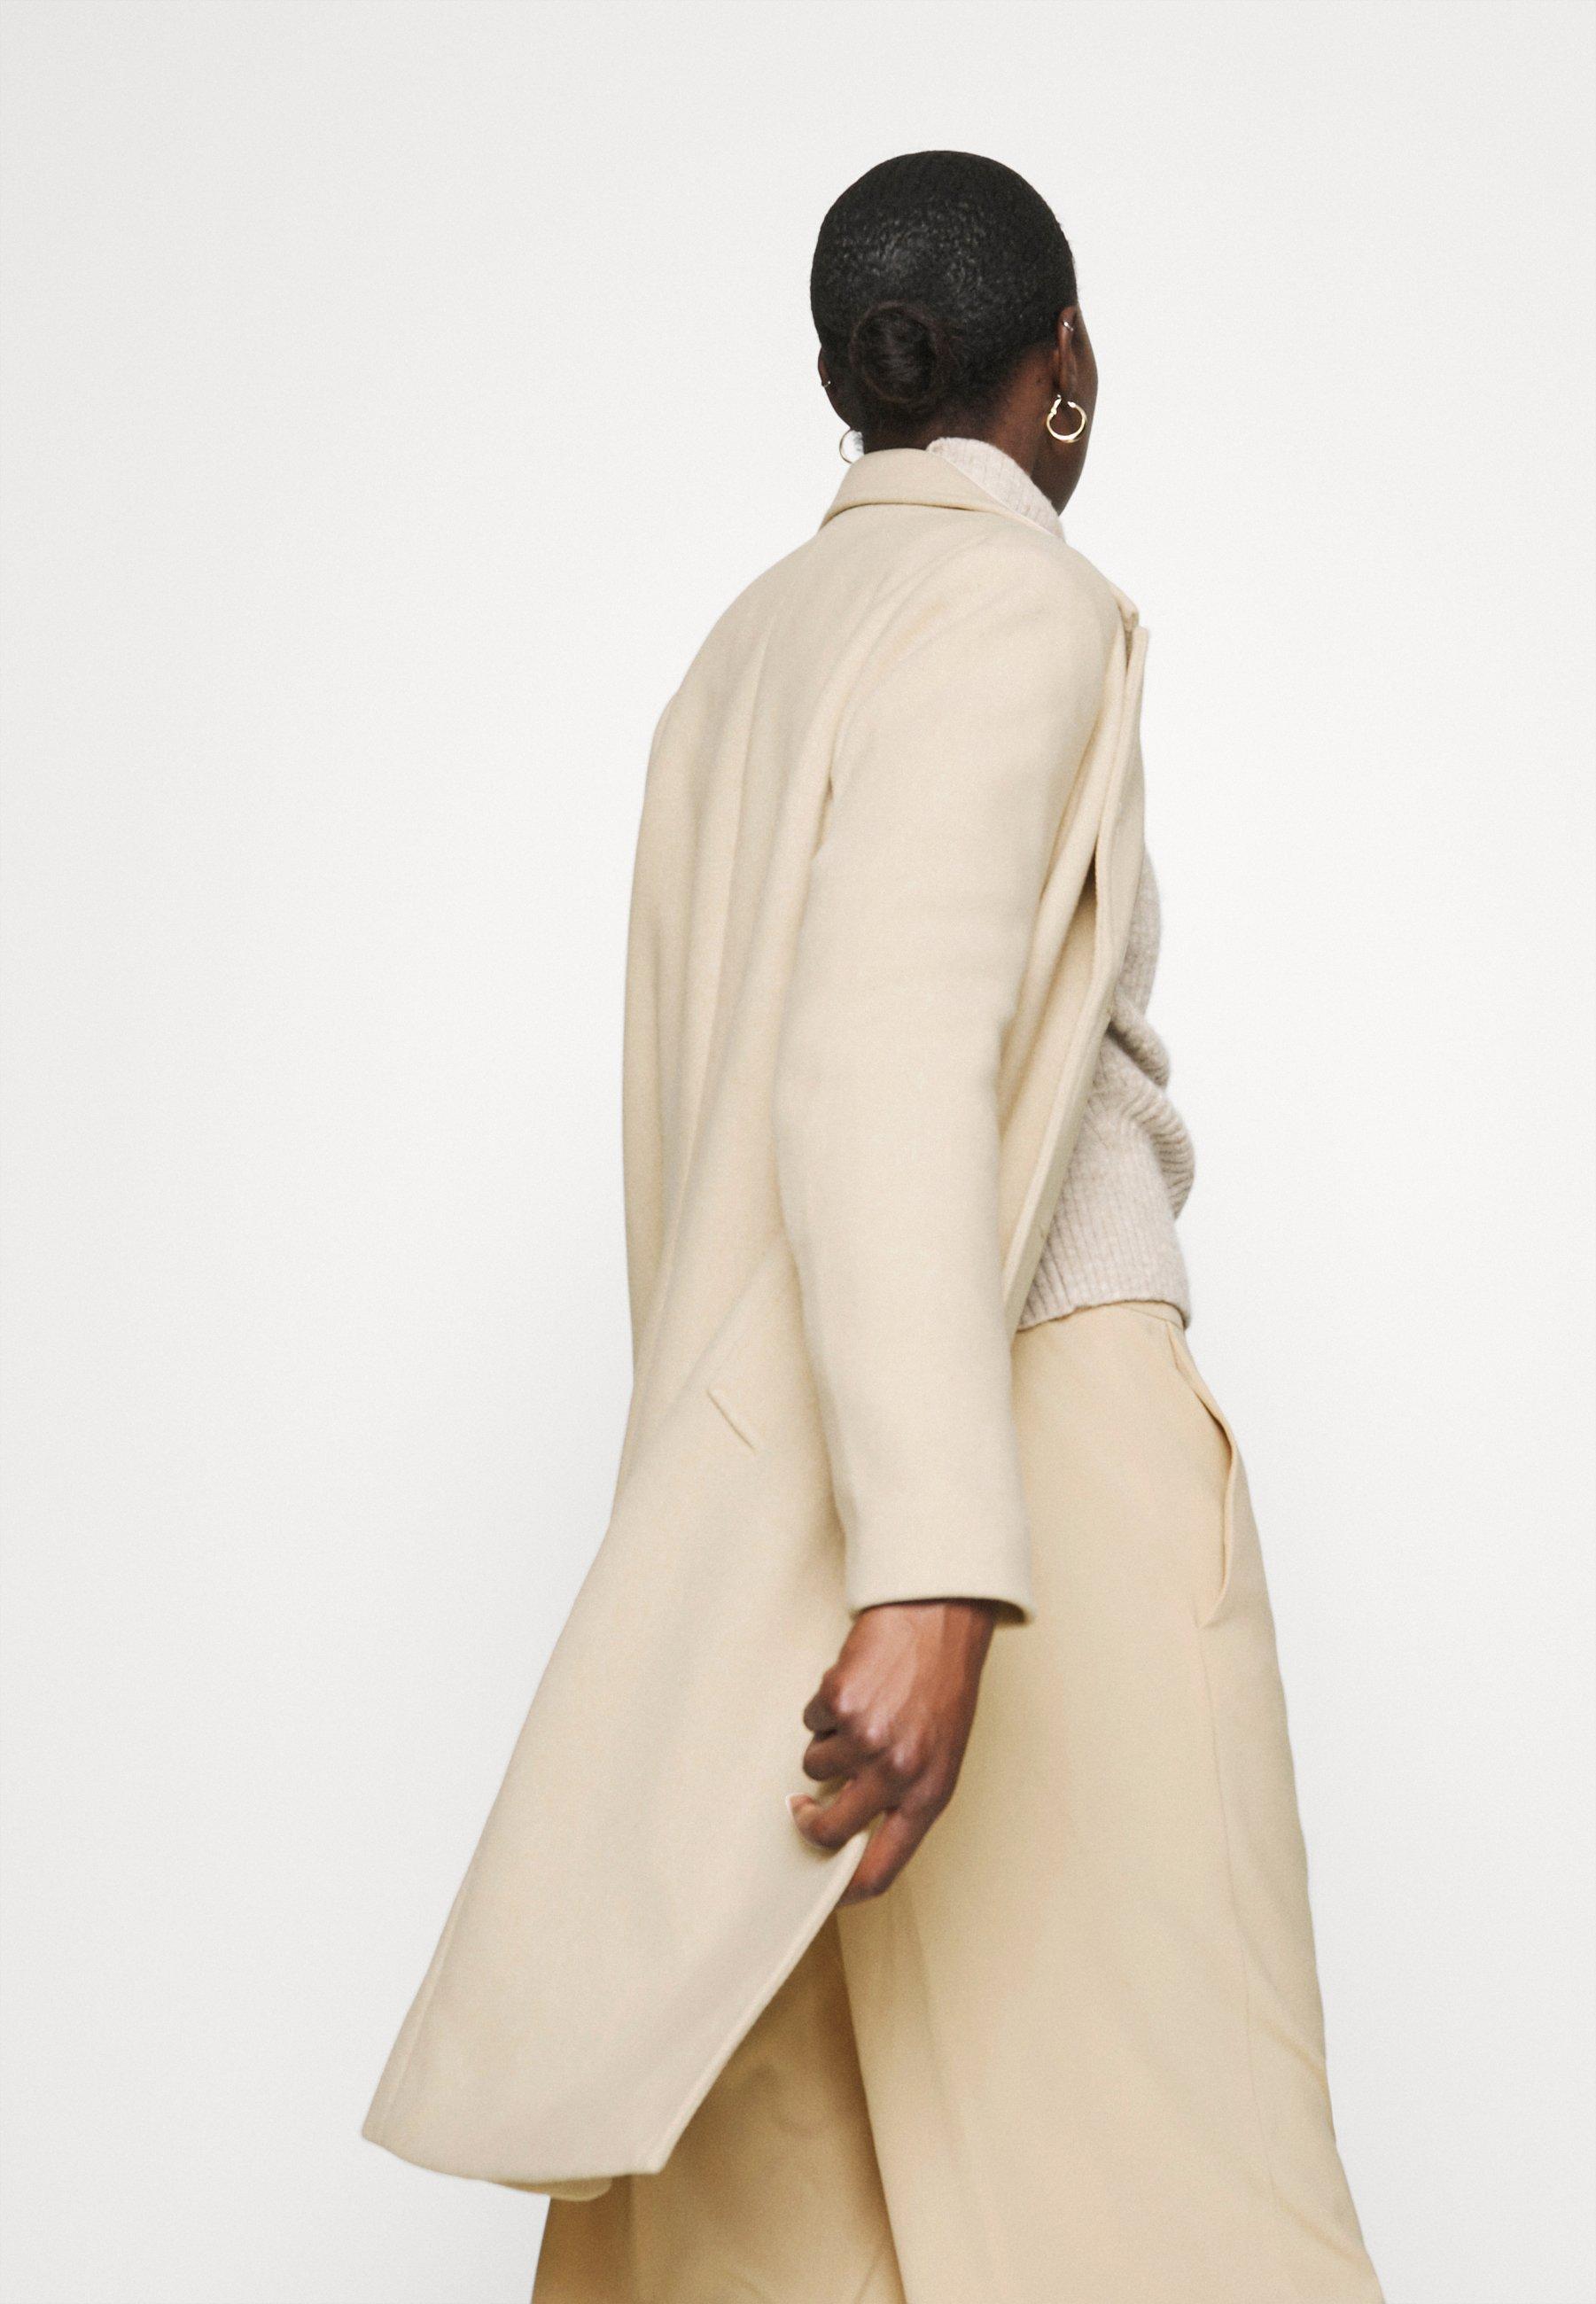 Abercrombie & Fitch Dad Coat - Kåpe / Frakk Creamy Khaki/beige